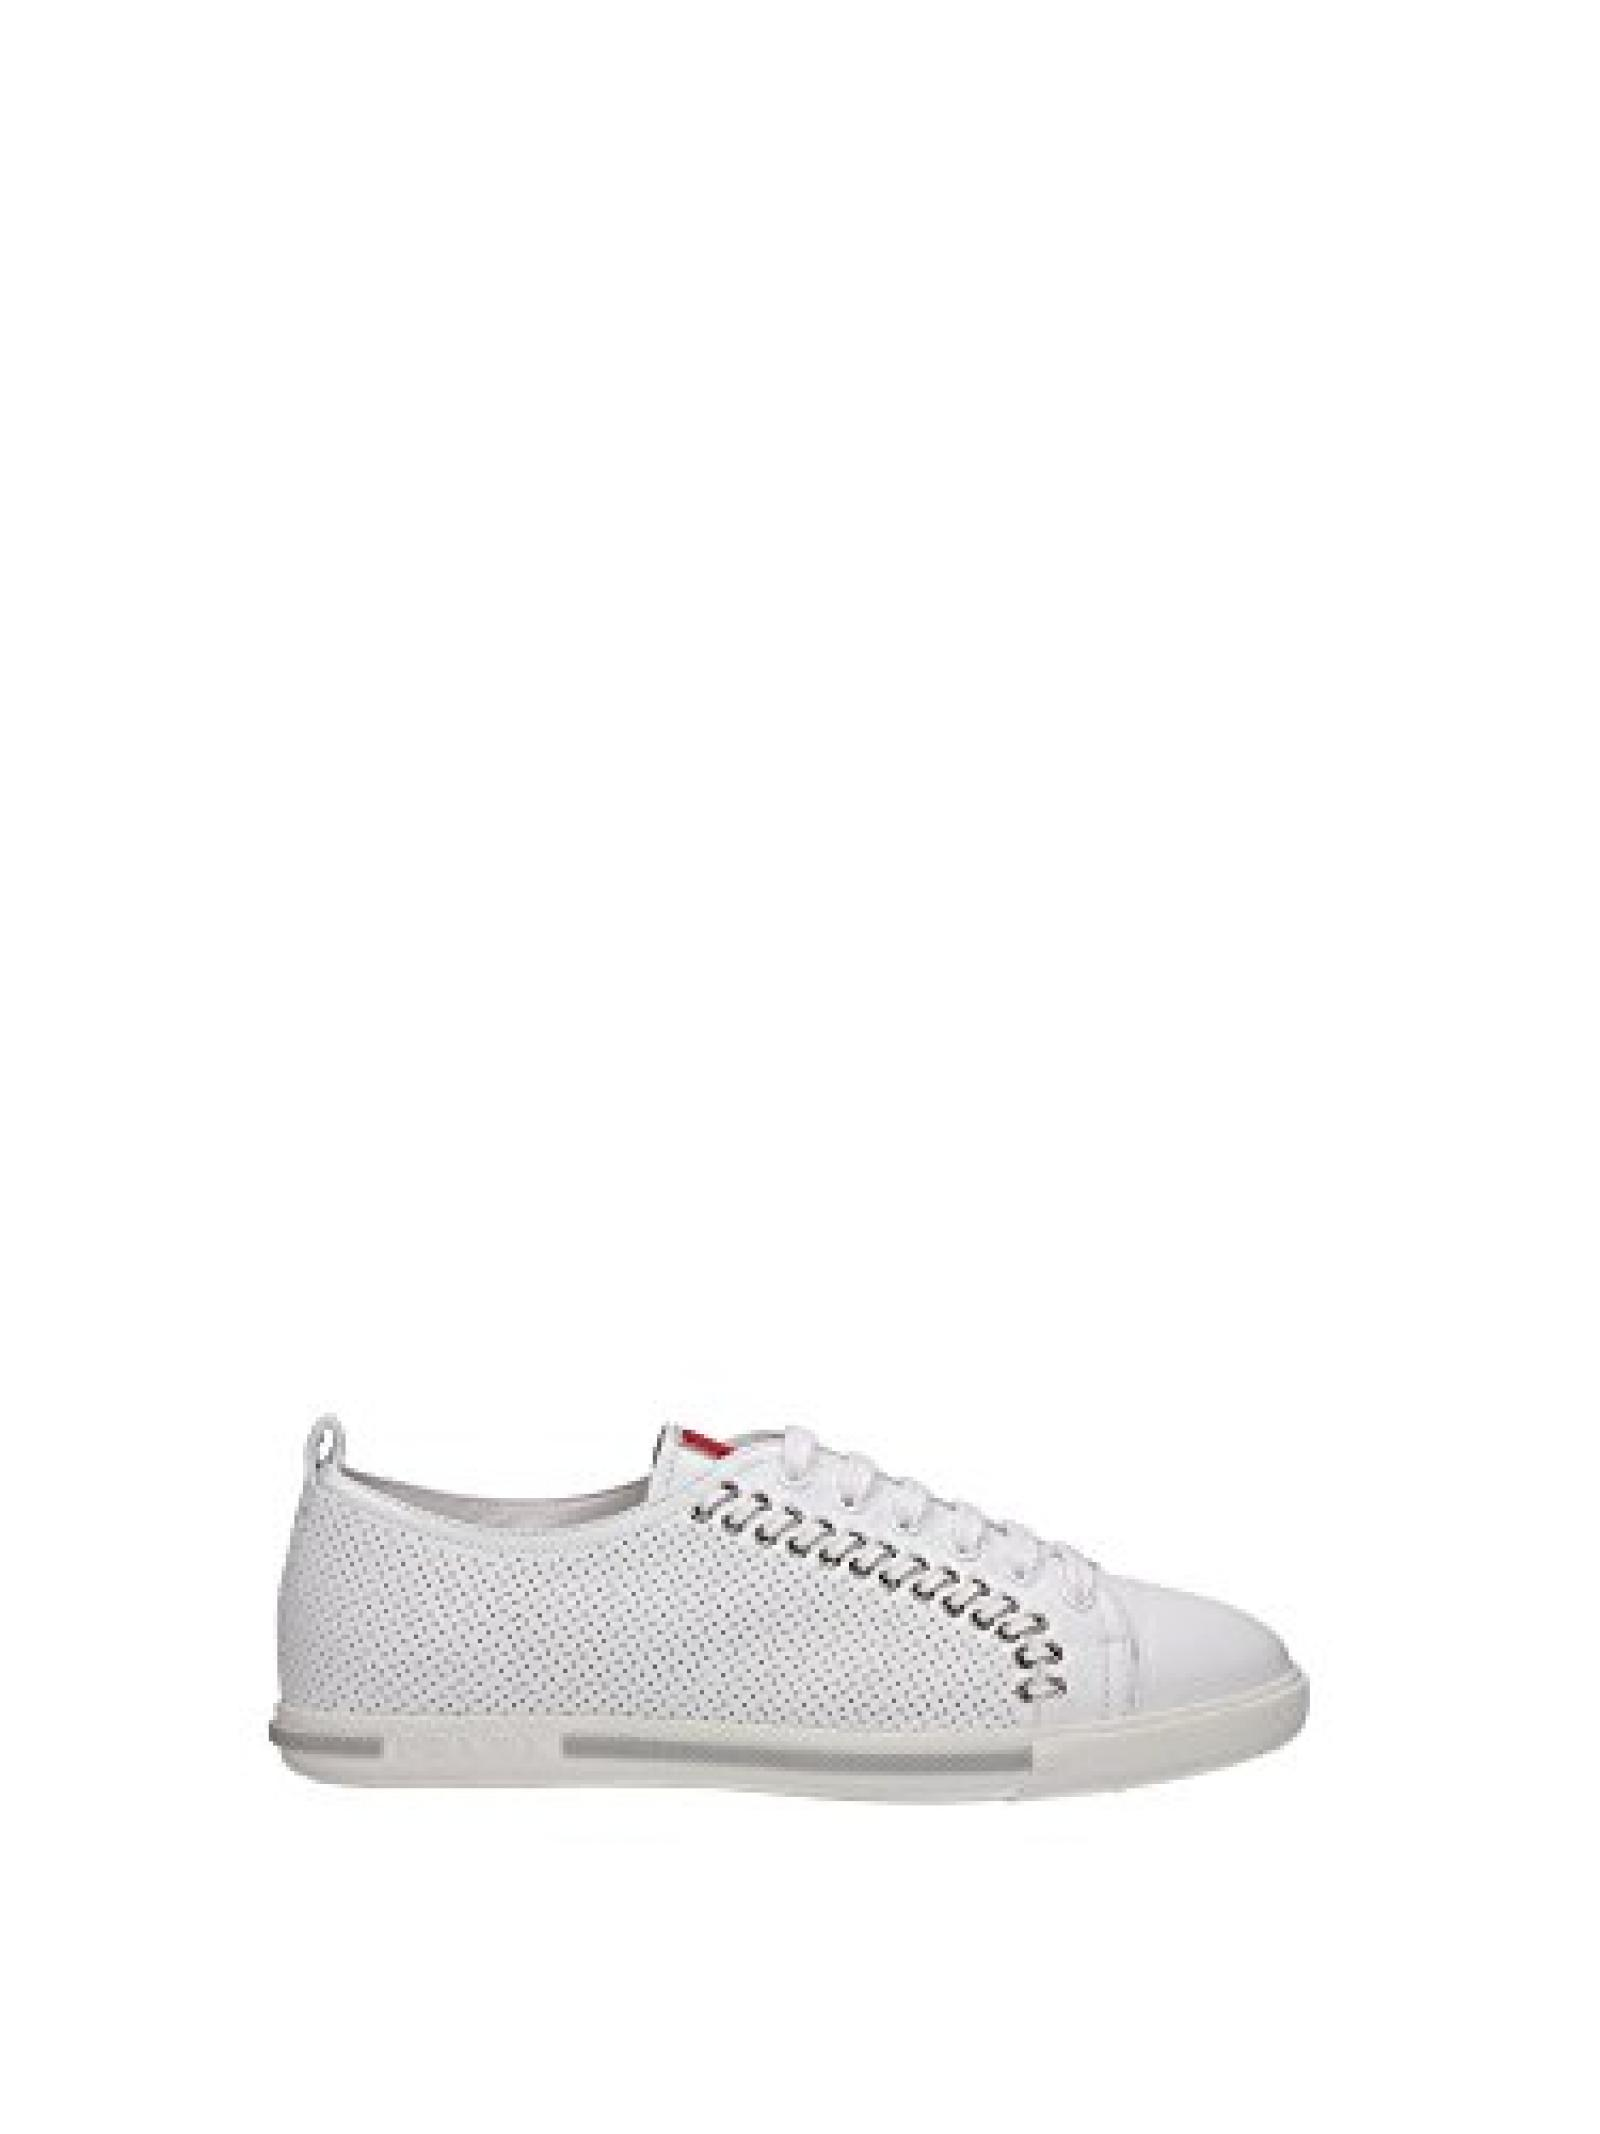 3E5847BIANCO Prada Sneakers Damen Leder